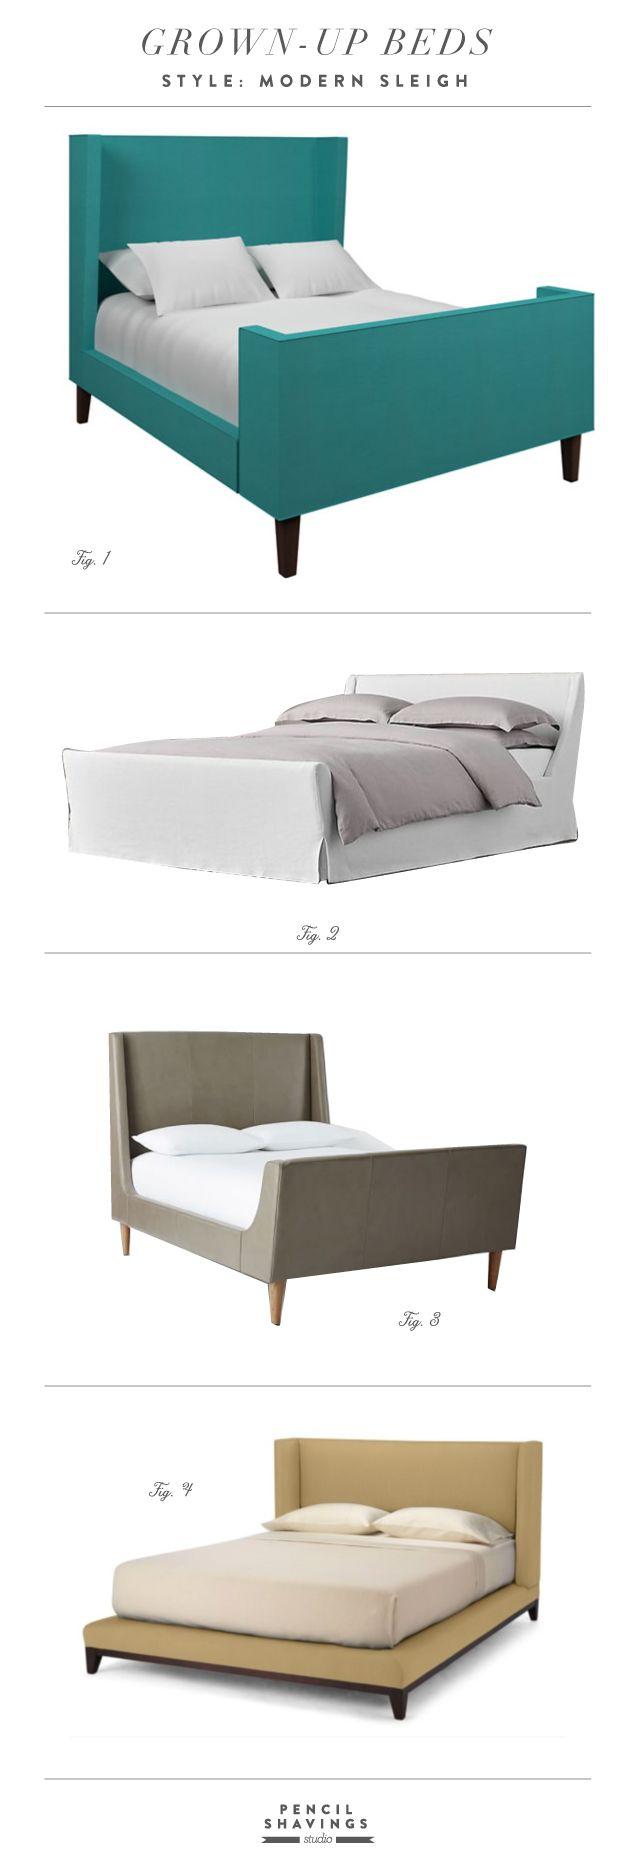 Grown-Up Style: Modern sleigh bed roundup - www.pencilshavingsstudio.com